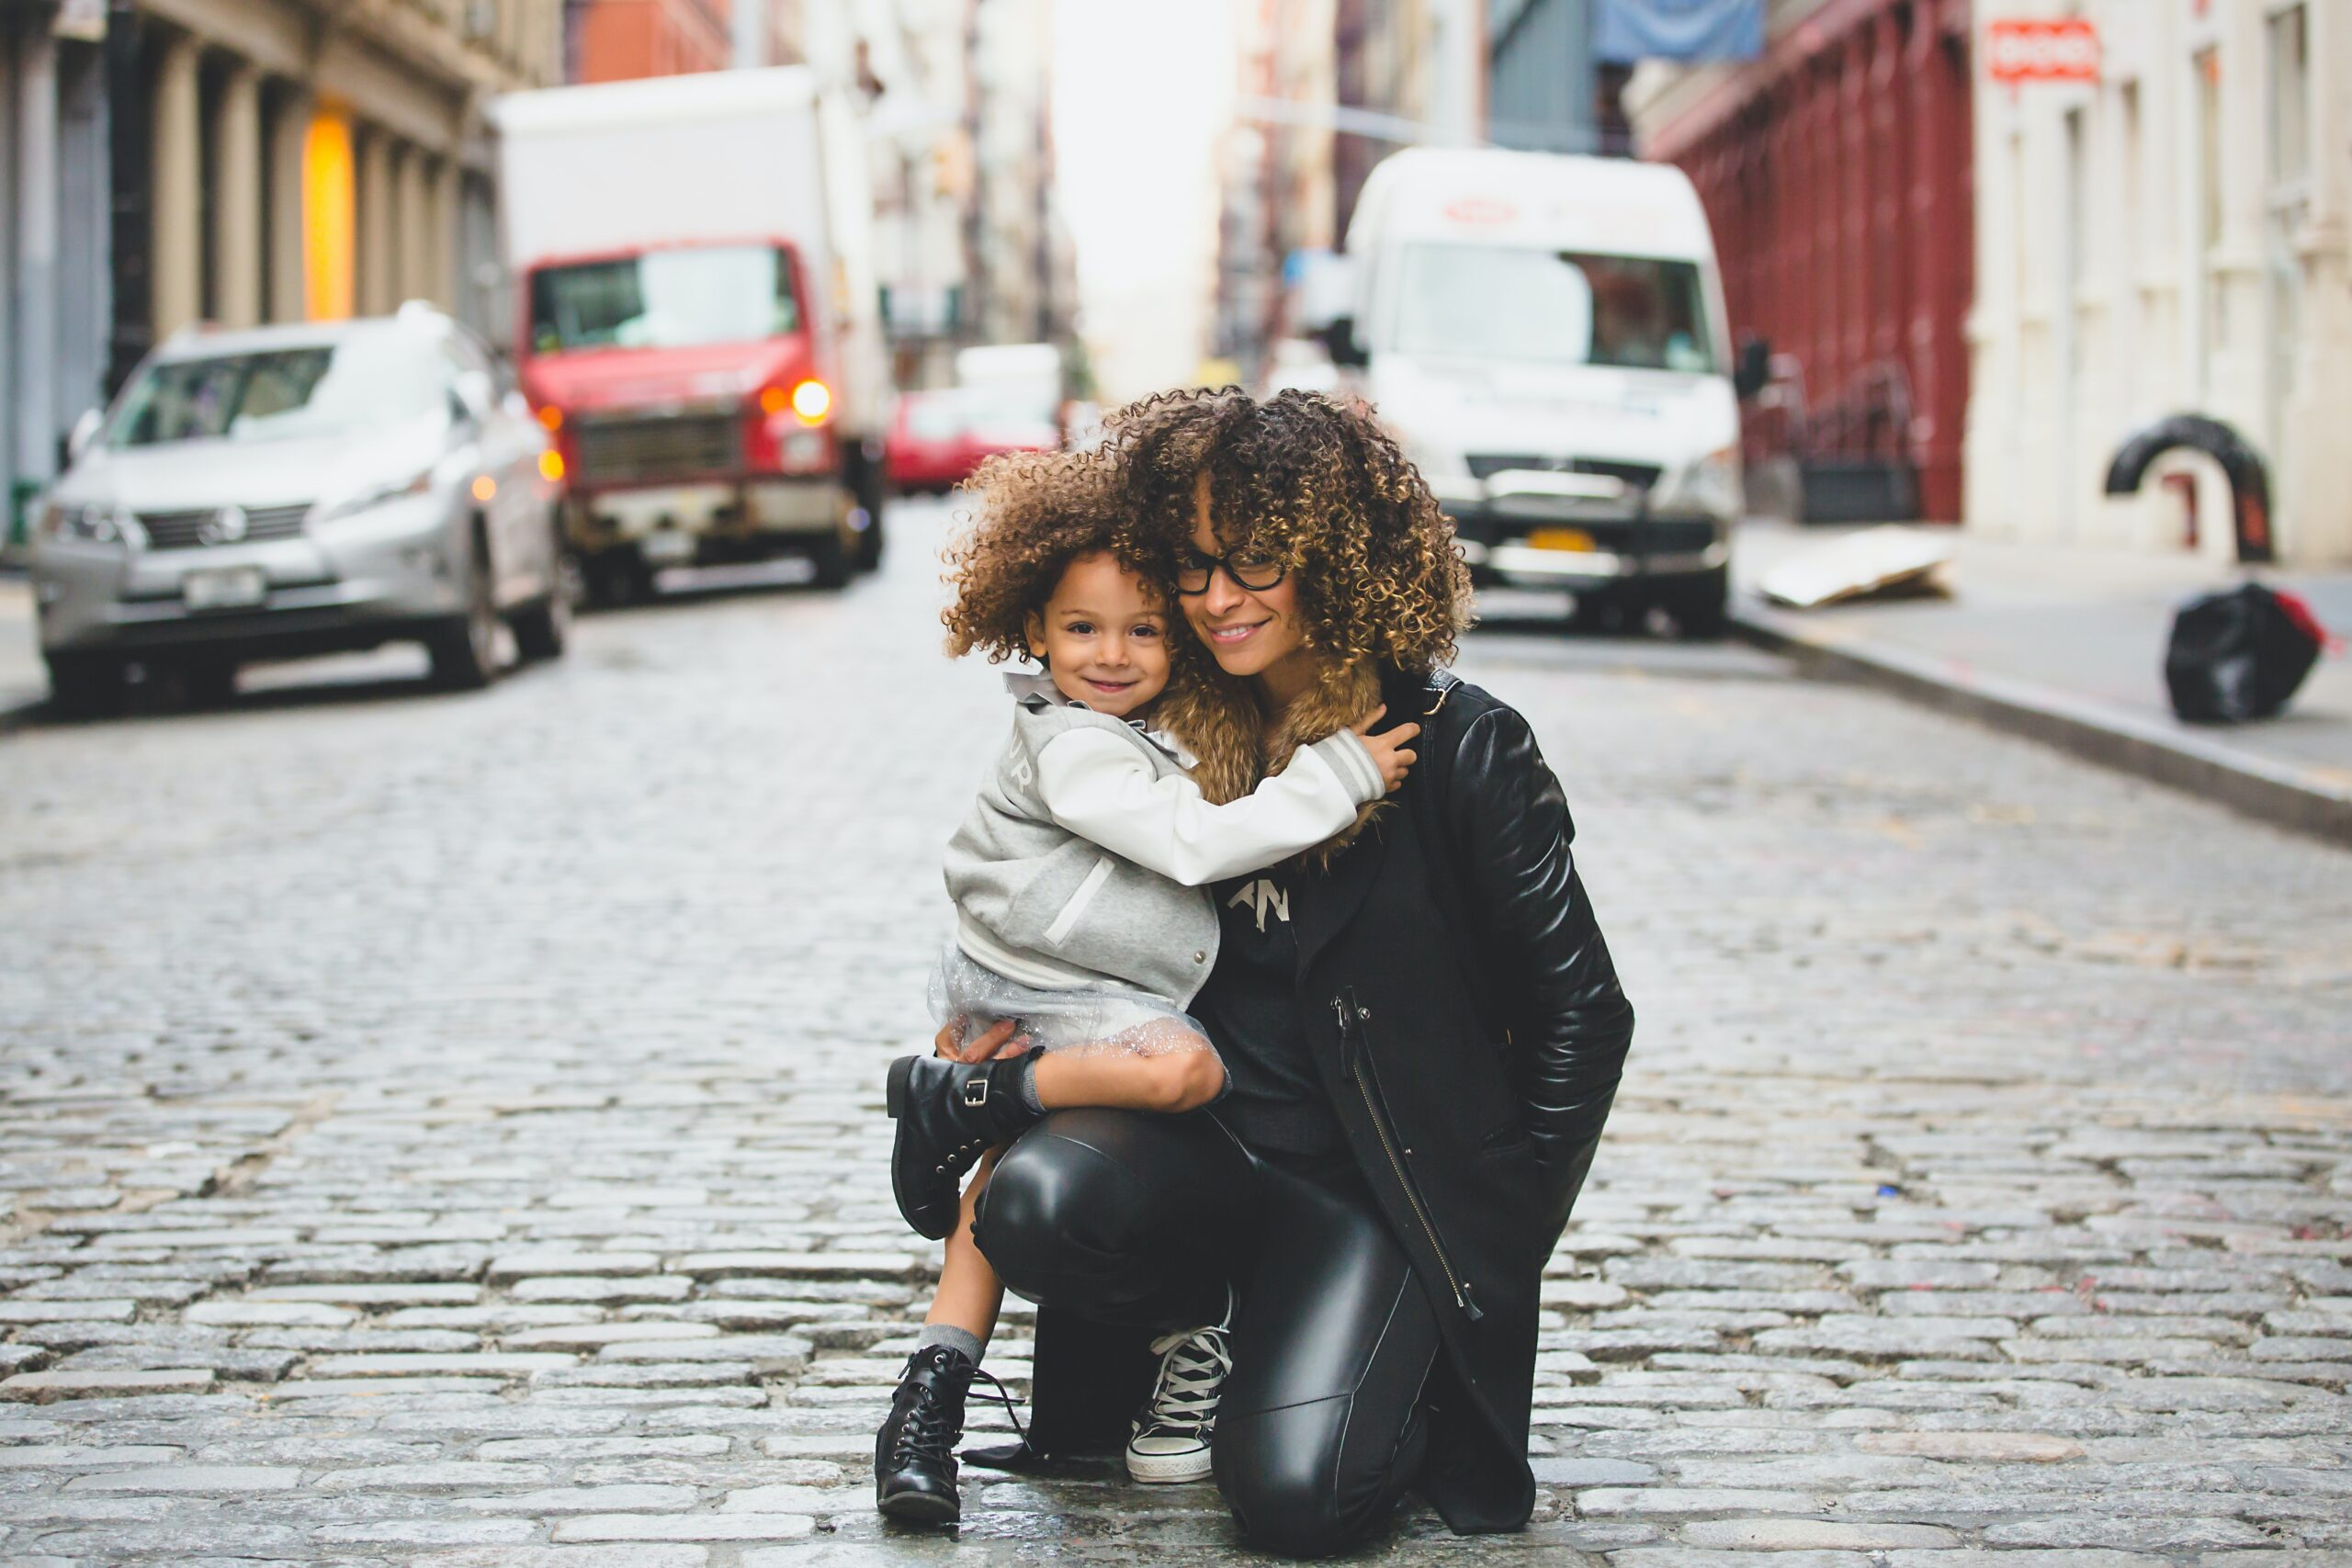 Creative Ways to Finance Your Child's Milestones